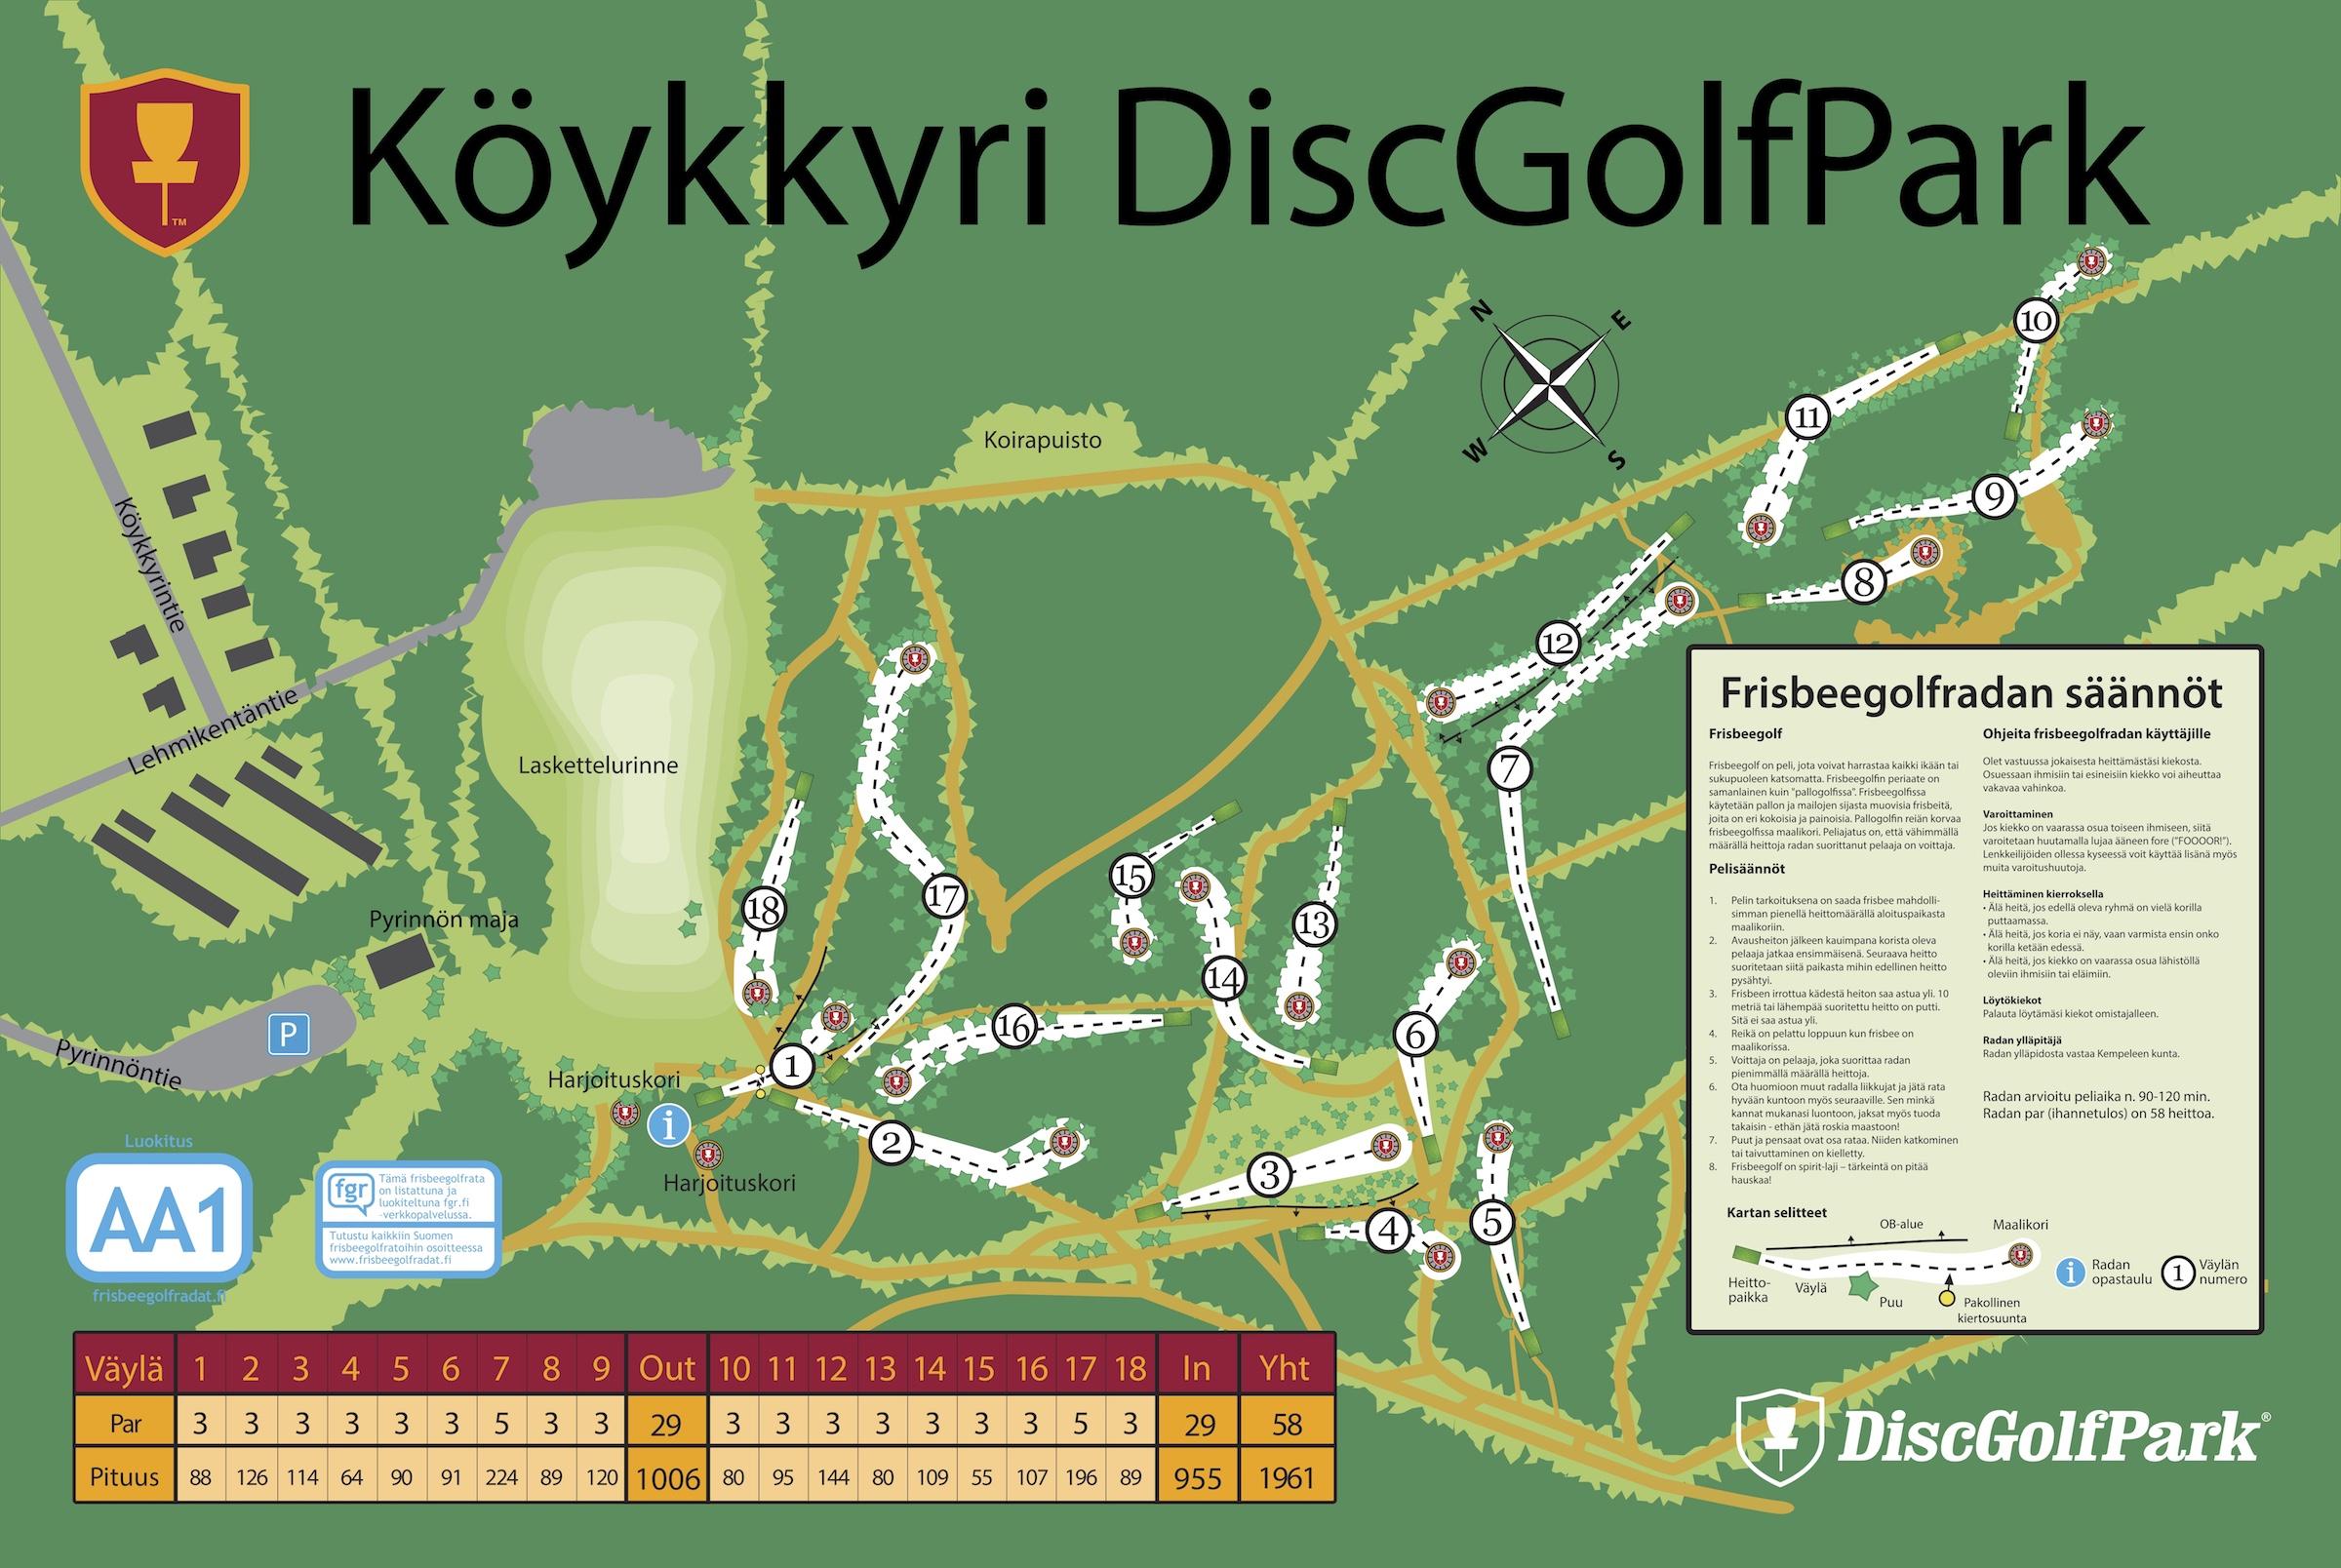 Koykkyri Discgolfpark Radat Frisbeegolfradat Fi